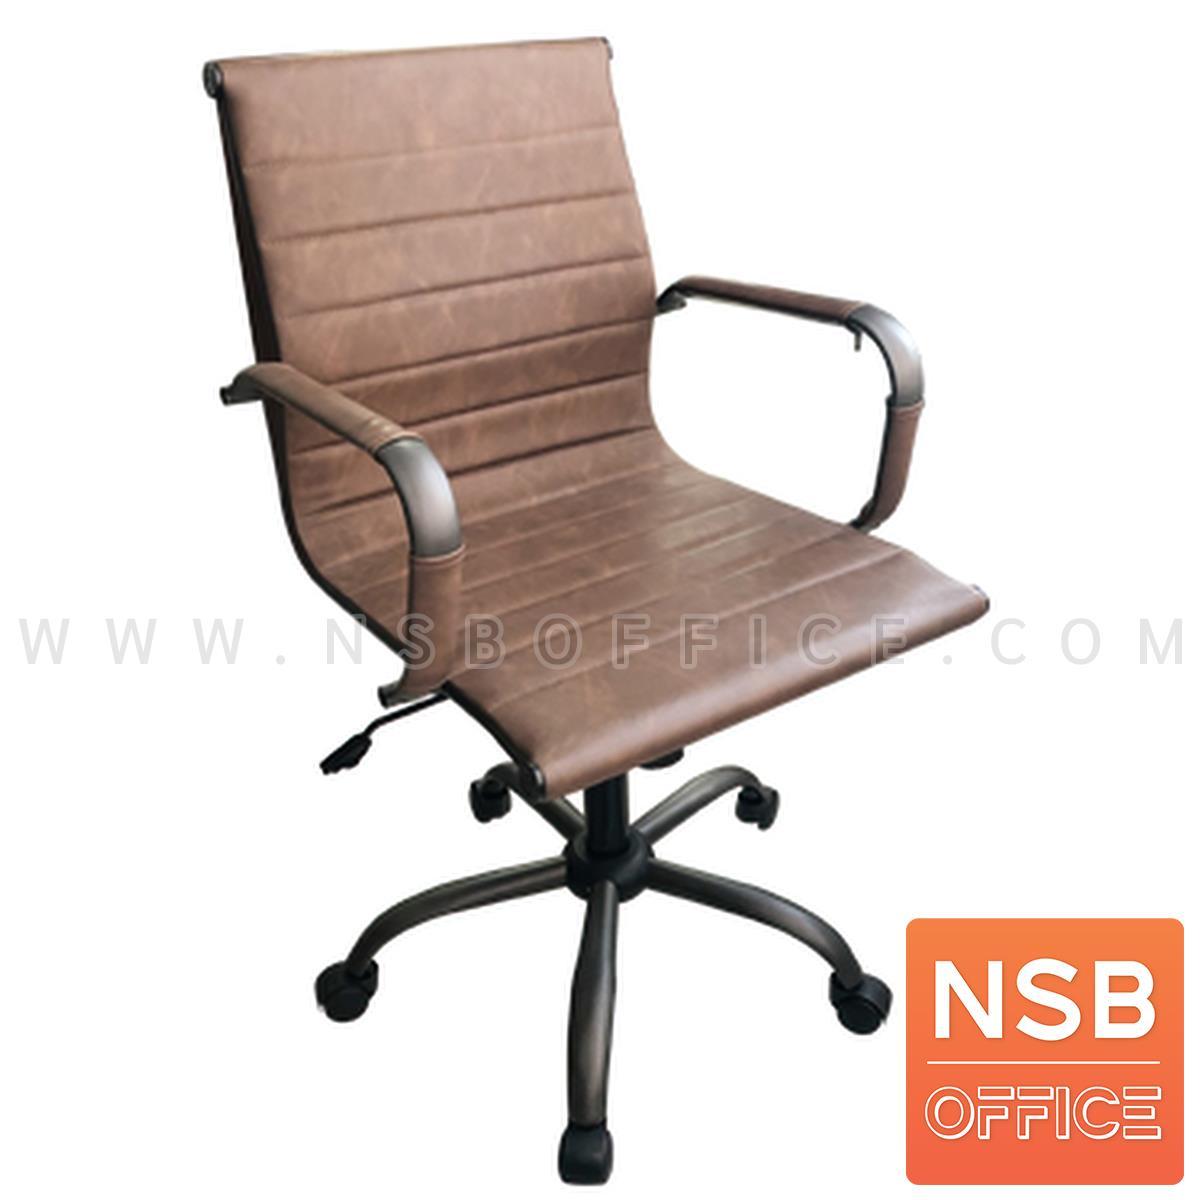 B03A515:เก้าอี้สำนักงาน รุ่น Whalen (วาห์เลน)  โช๊คแก๊ส ก้อนโยก ขาเหล็กชุบโครเมี่ยม